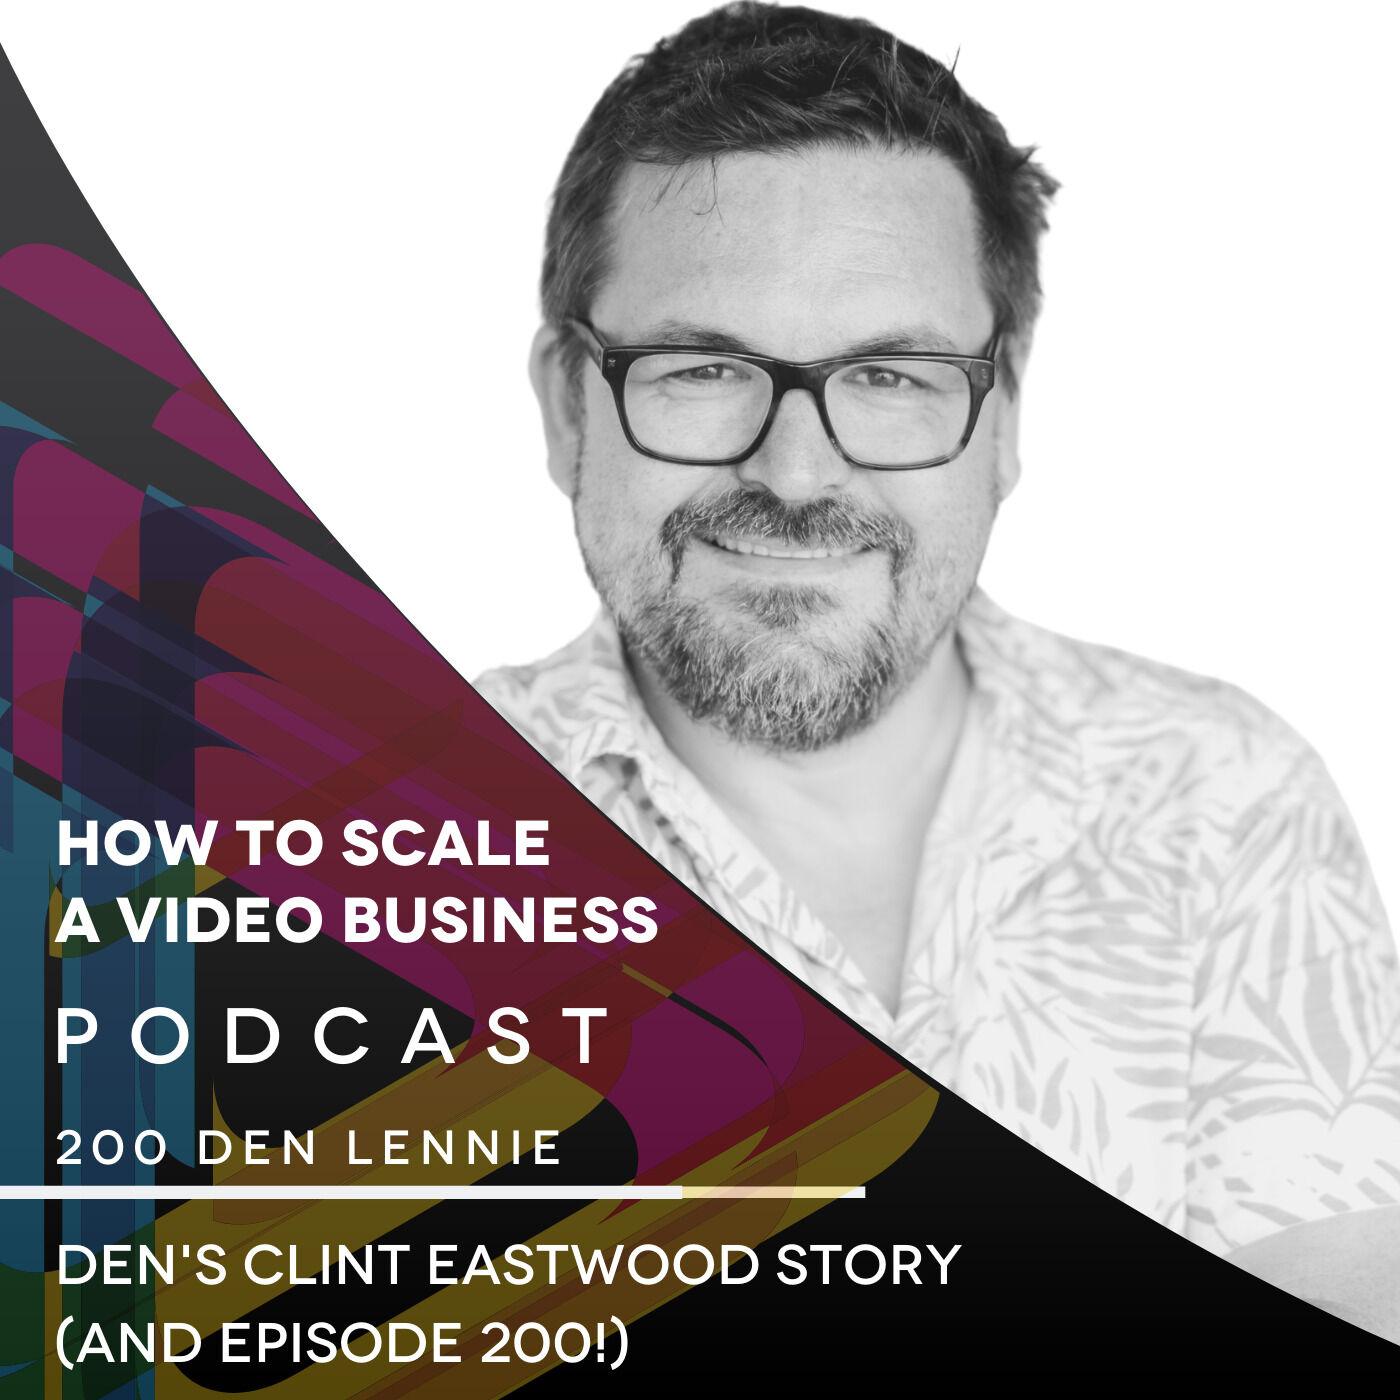 Den's Clint Eastwood Story (And Episode 200!) EP #200 - Den Lennie